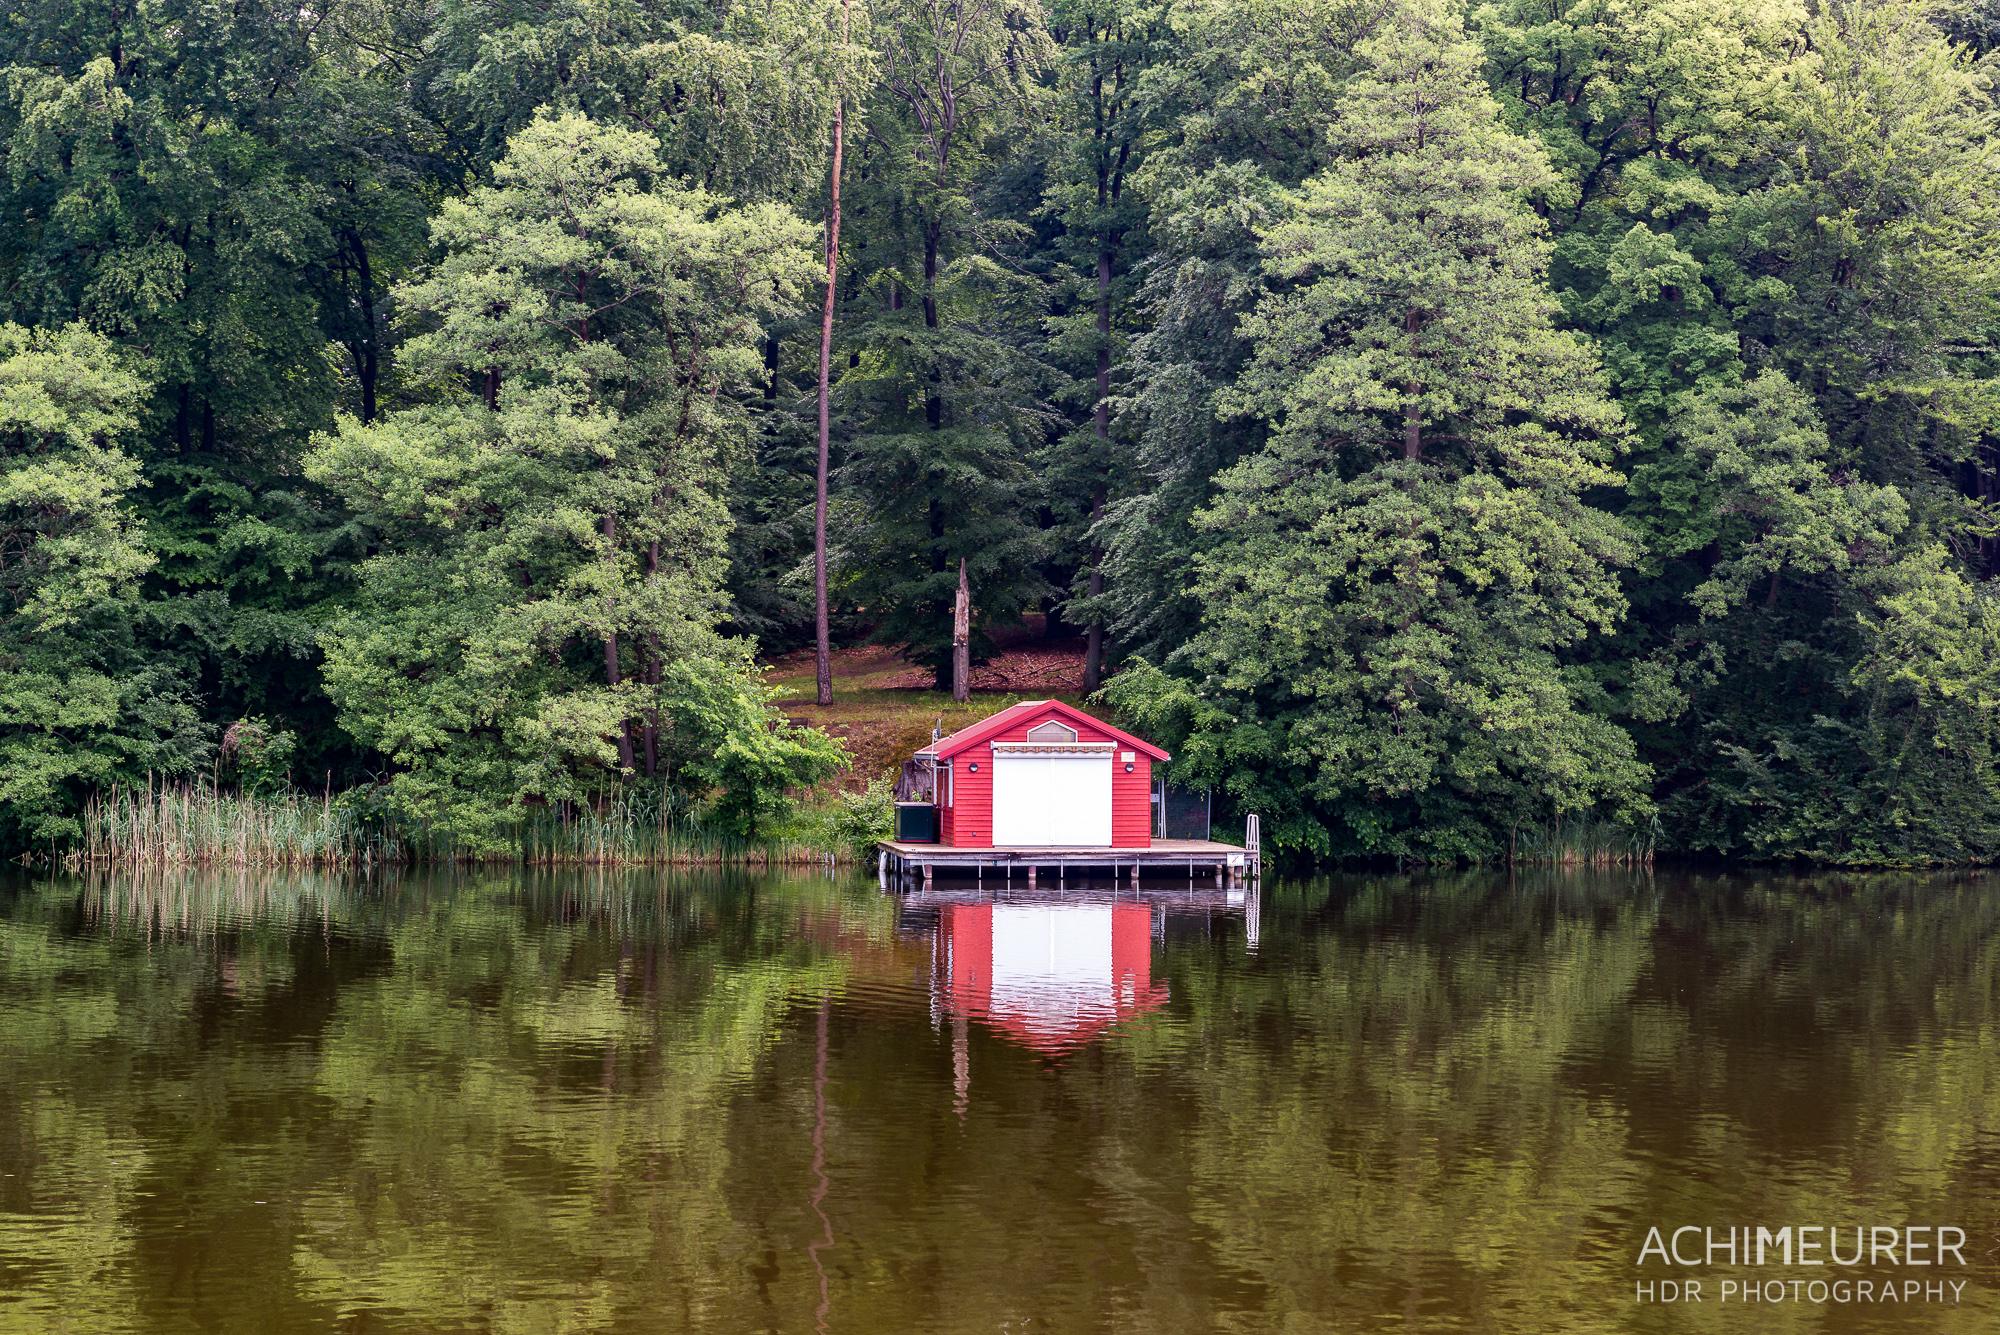 Hausboot-Kuhnle-Mueritz-Mecklenburg-Vorpommern-See_2883